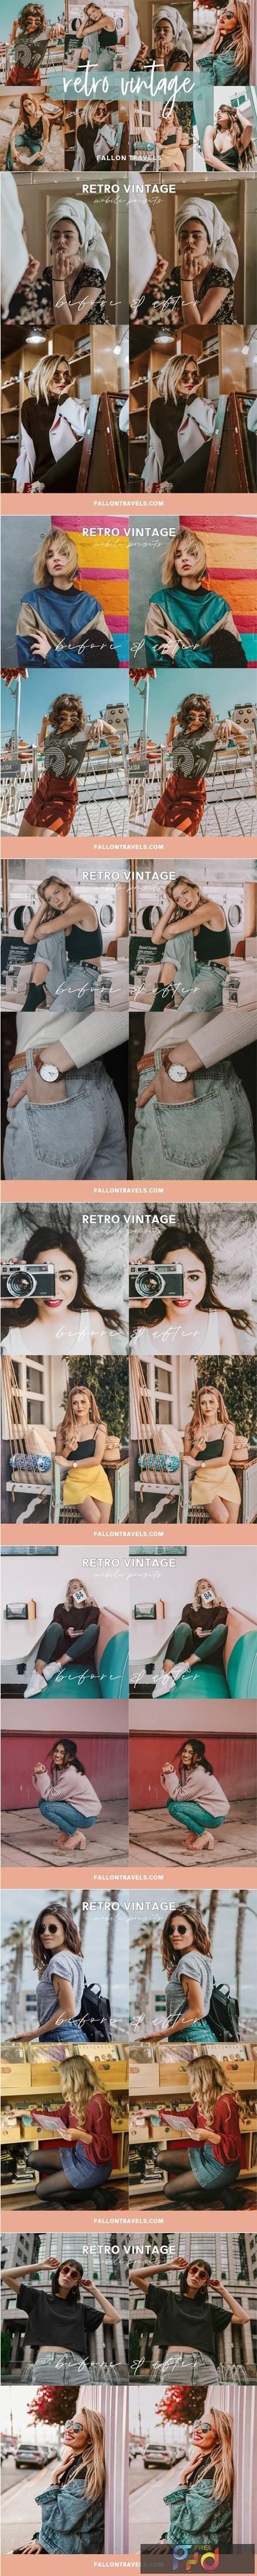 Retro Lightroom Mobile Presets 5014190 1